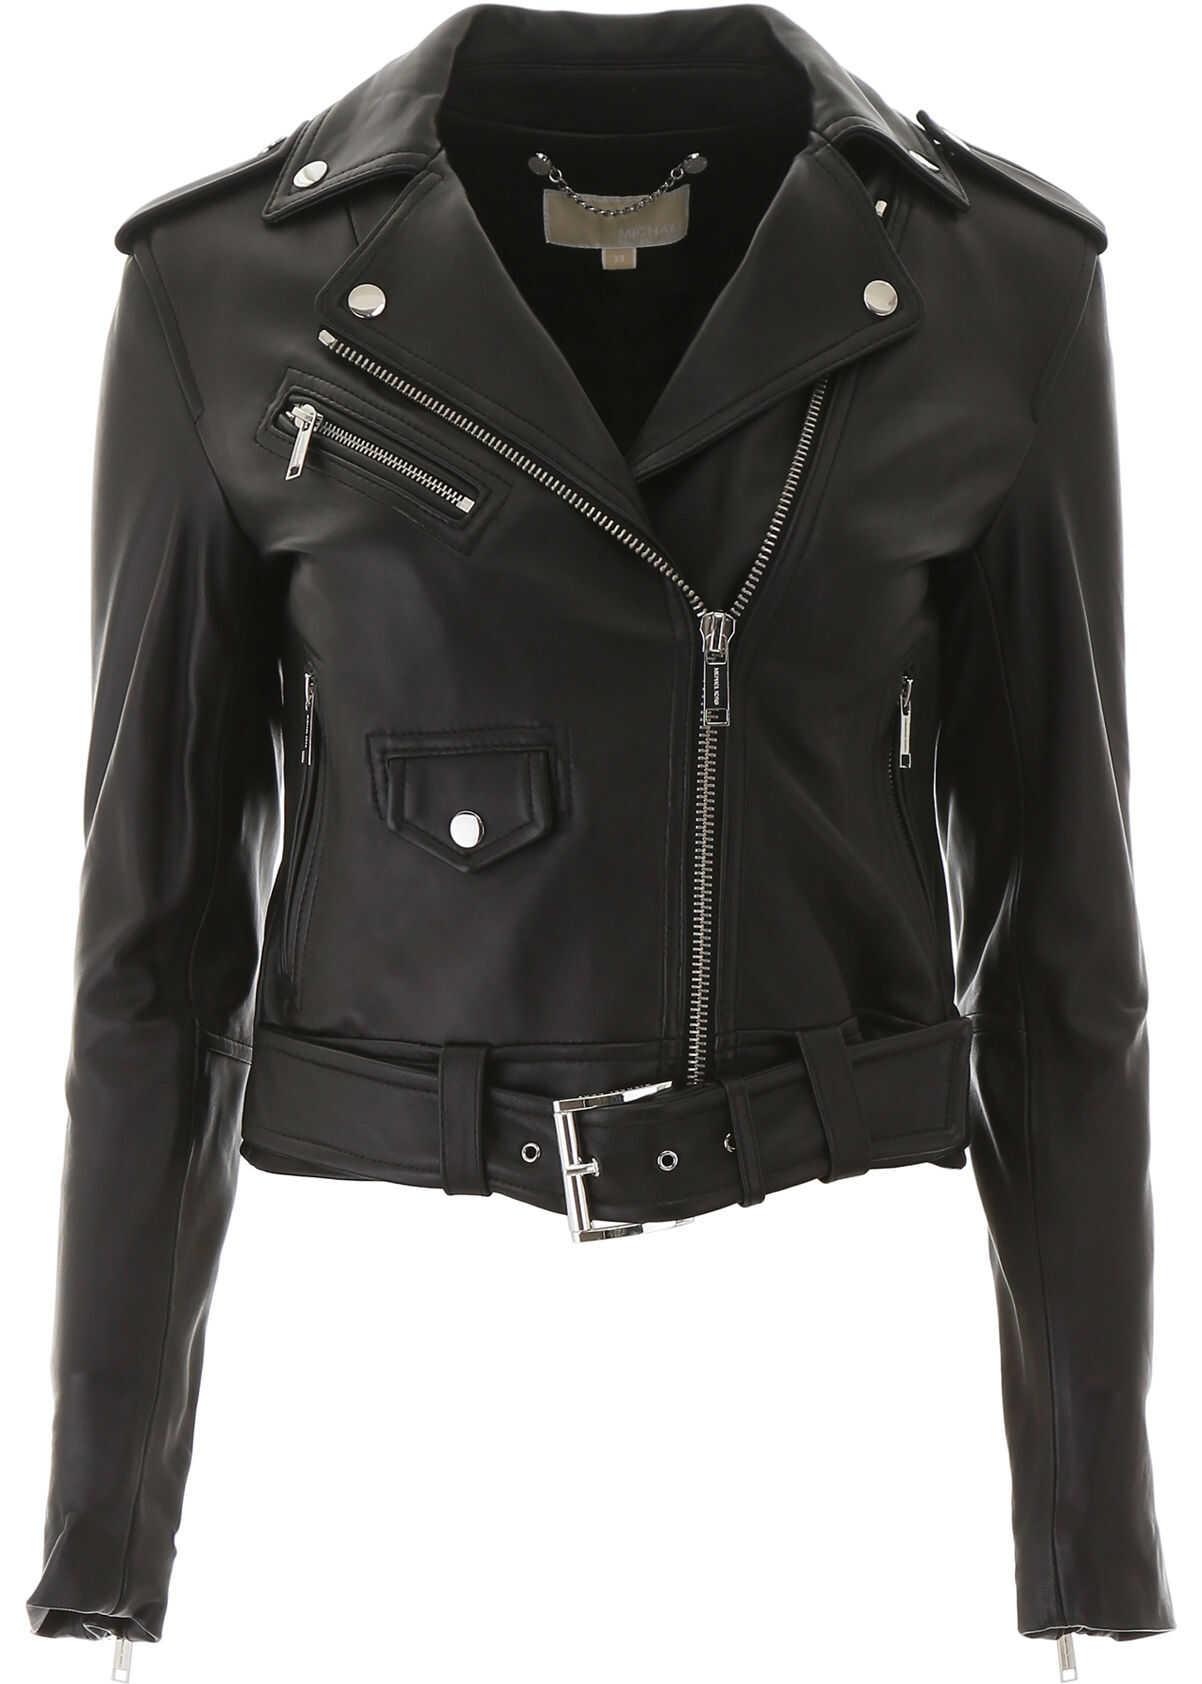 Michael Kors Biker Jacket BLACK